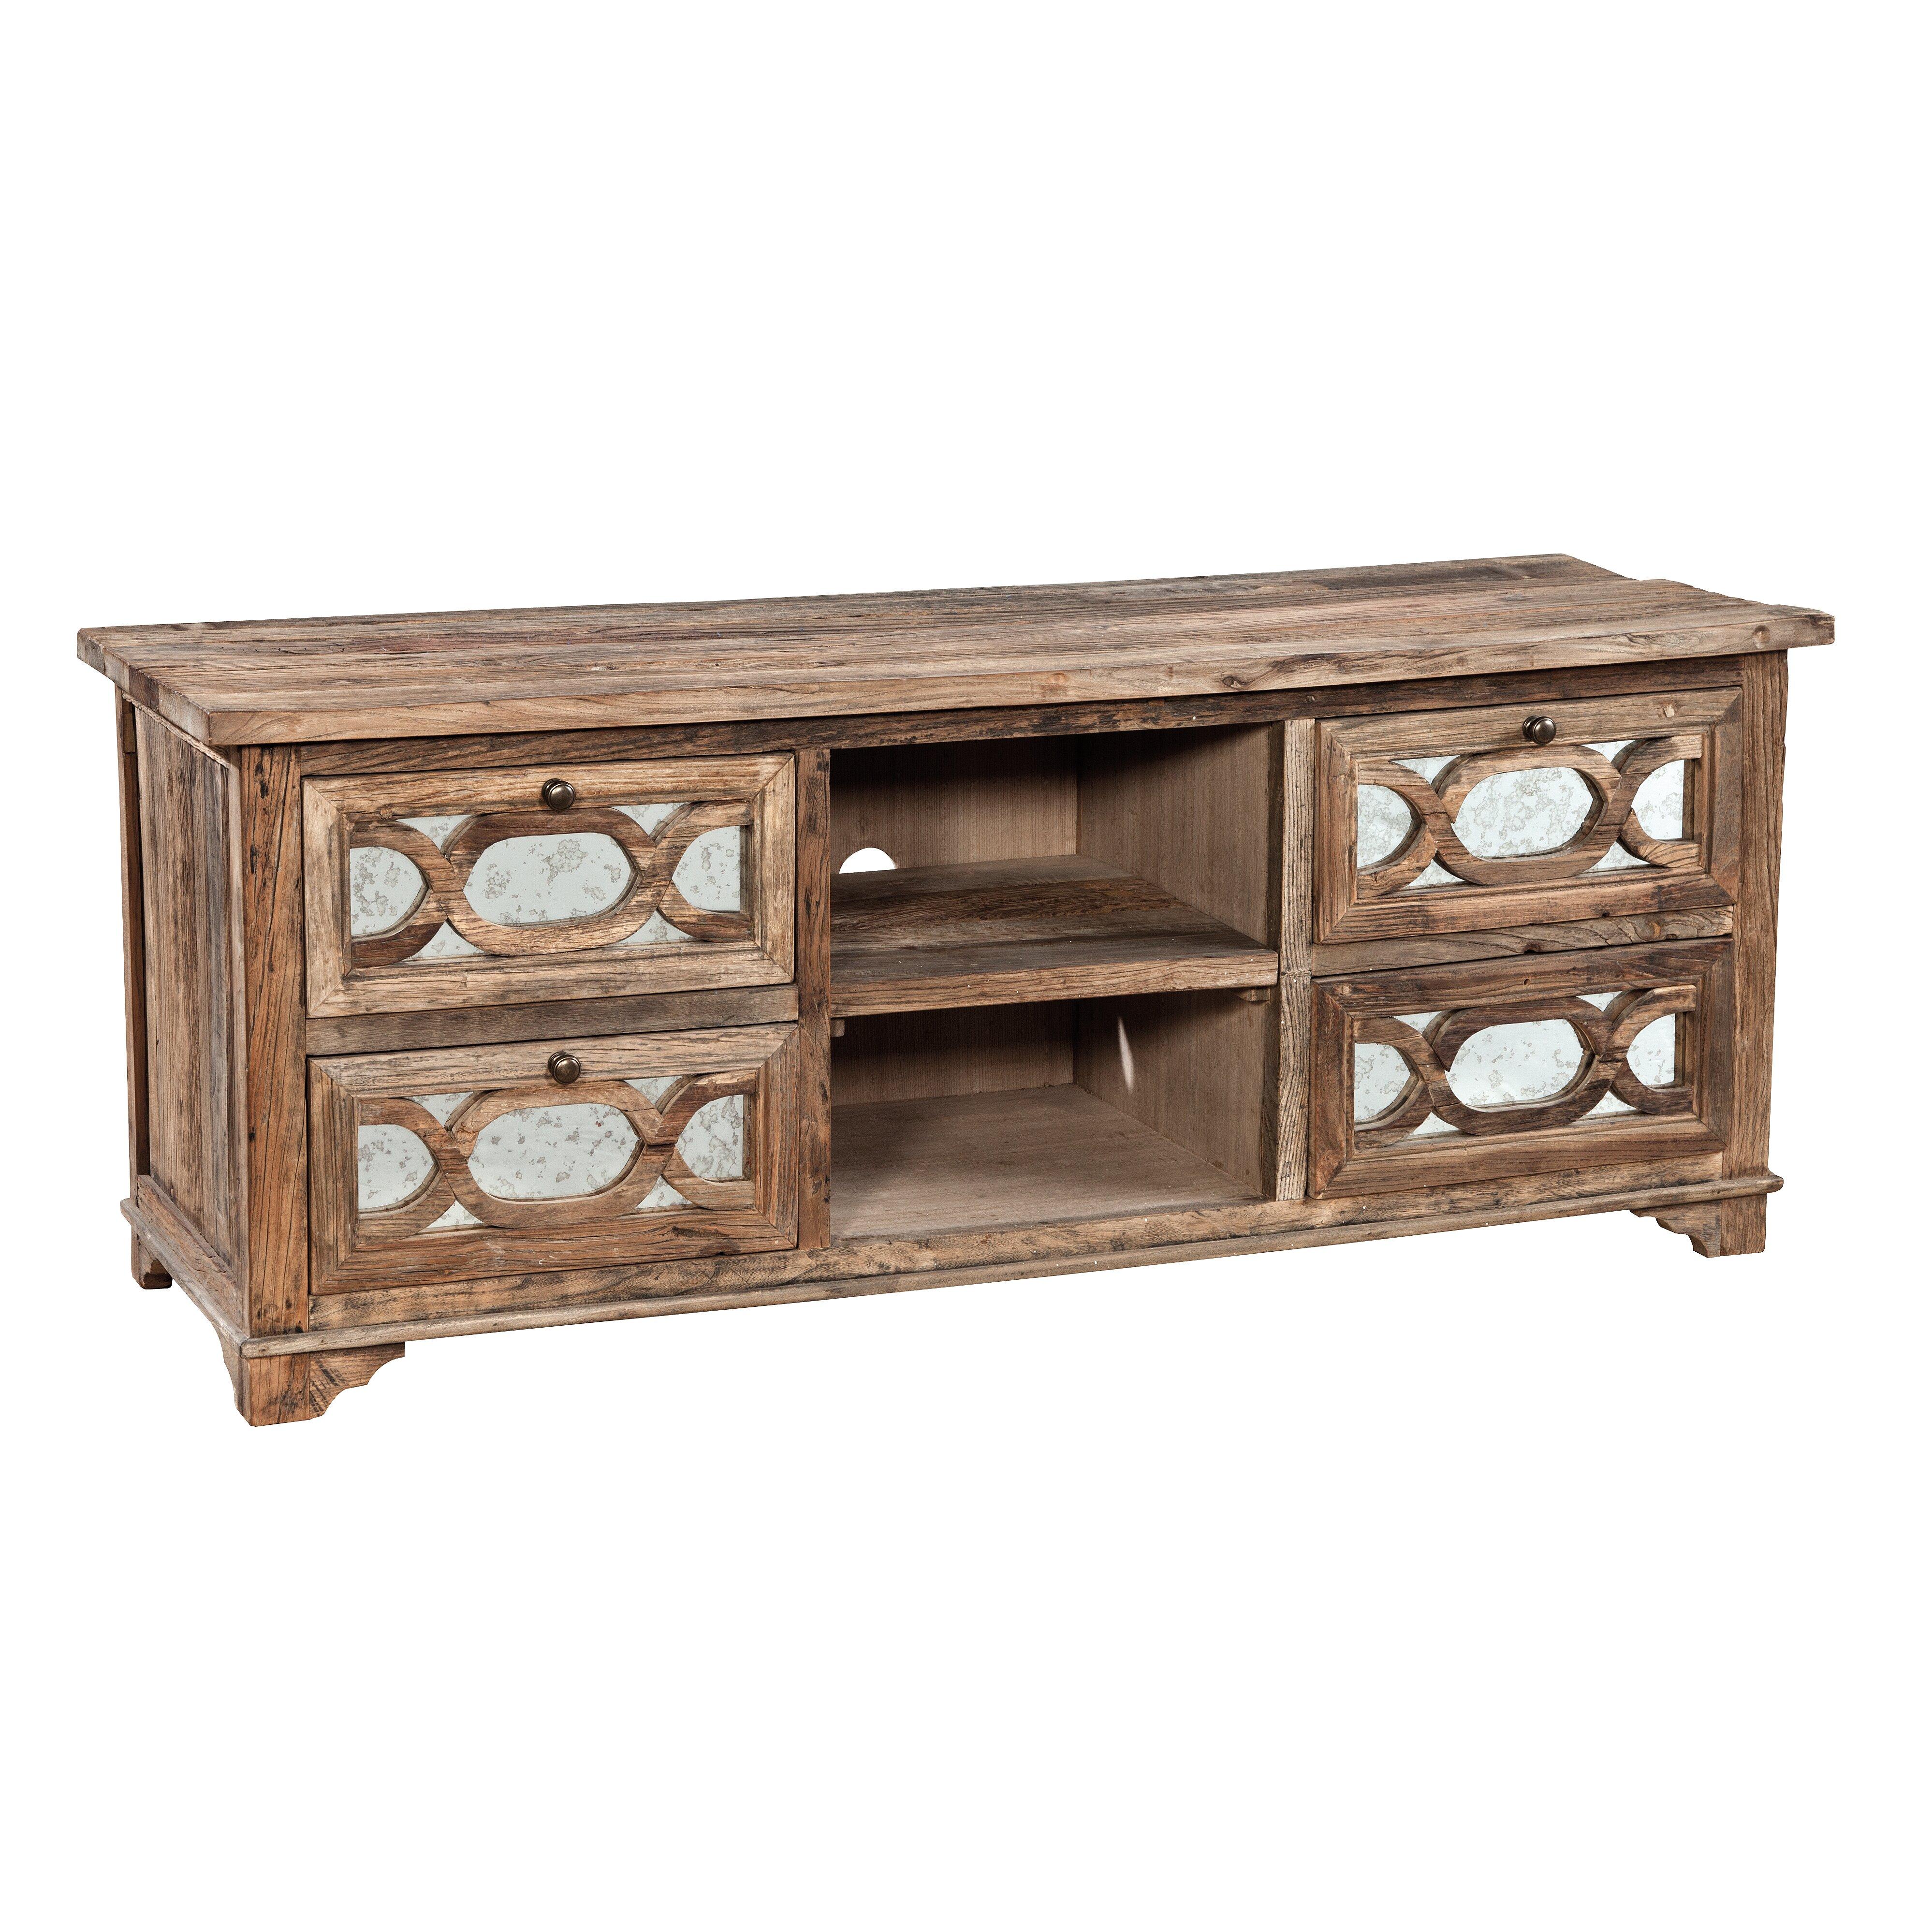 Furniture Classics LTD Mirrored Media TV Stand & Reviews